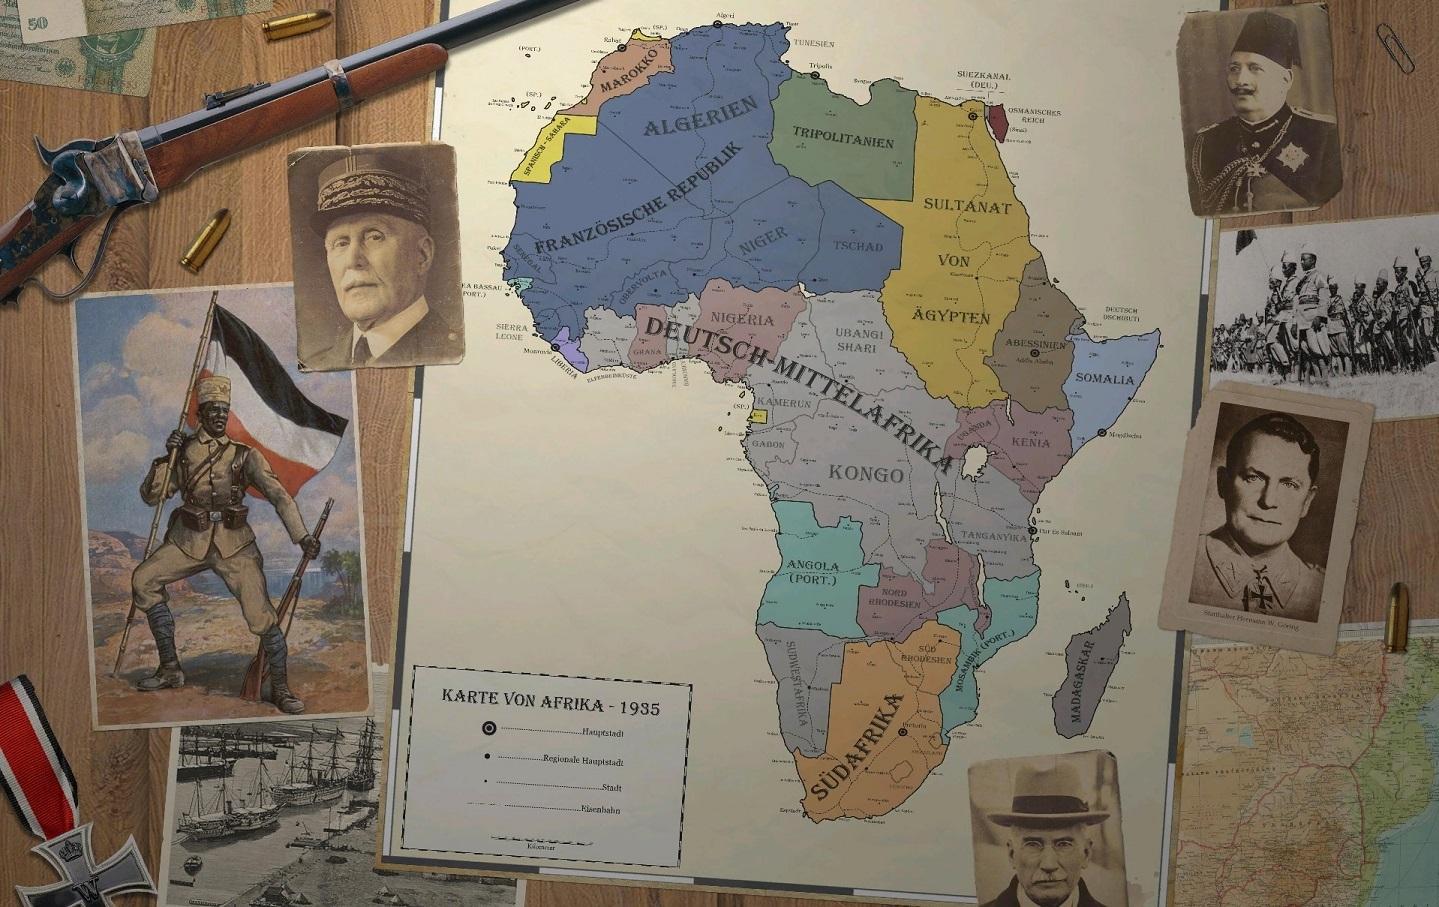 Understanding Alternative Histories: Mittelafrika